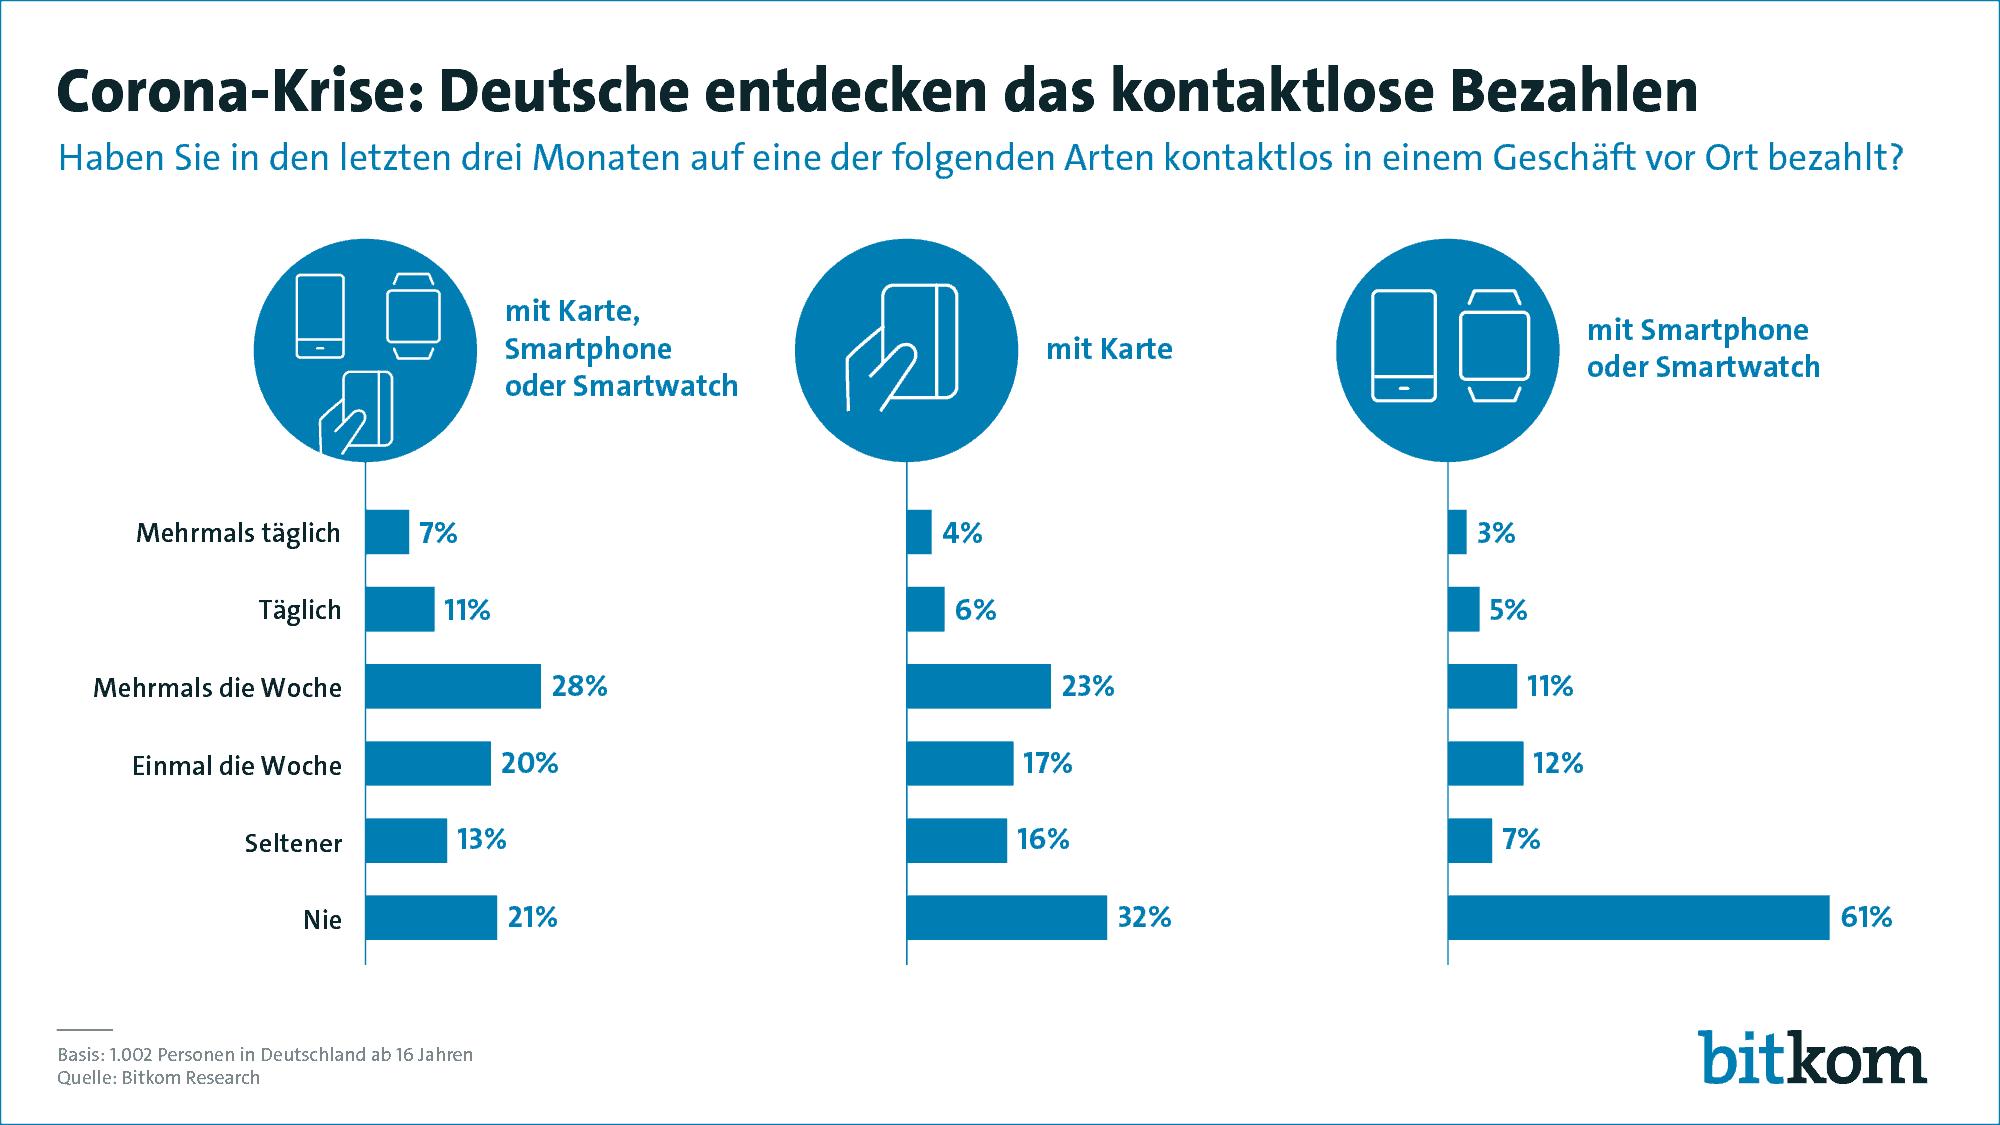 Smartphone, Karte oder Smartwatch : 79% kontaktlos!